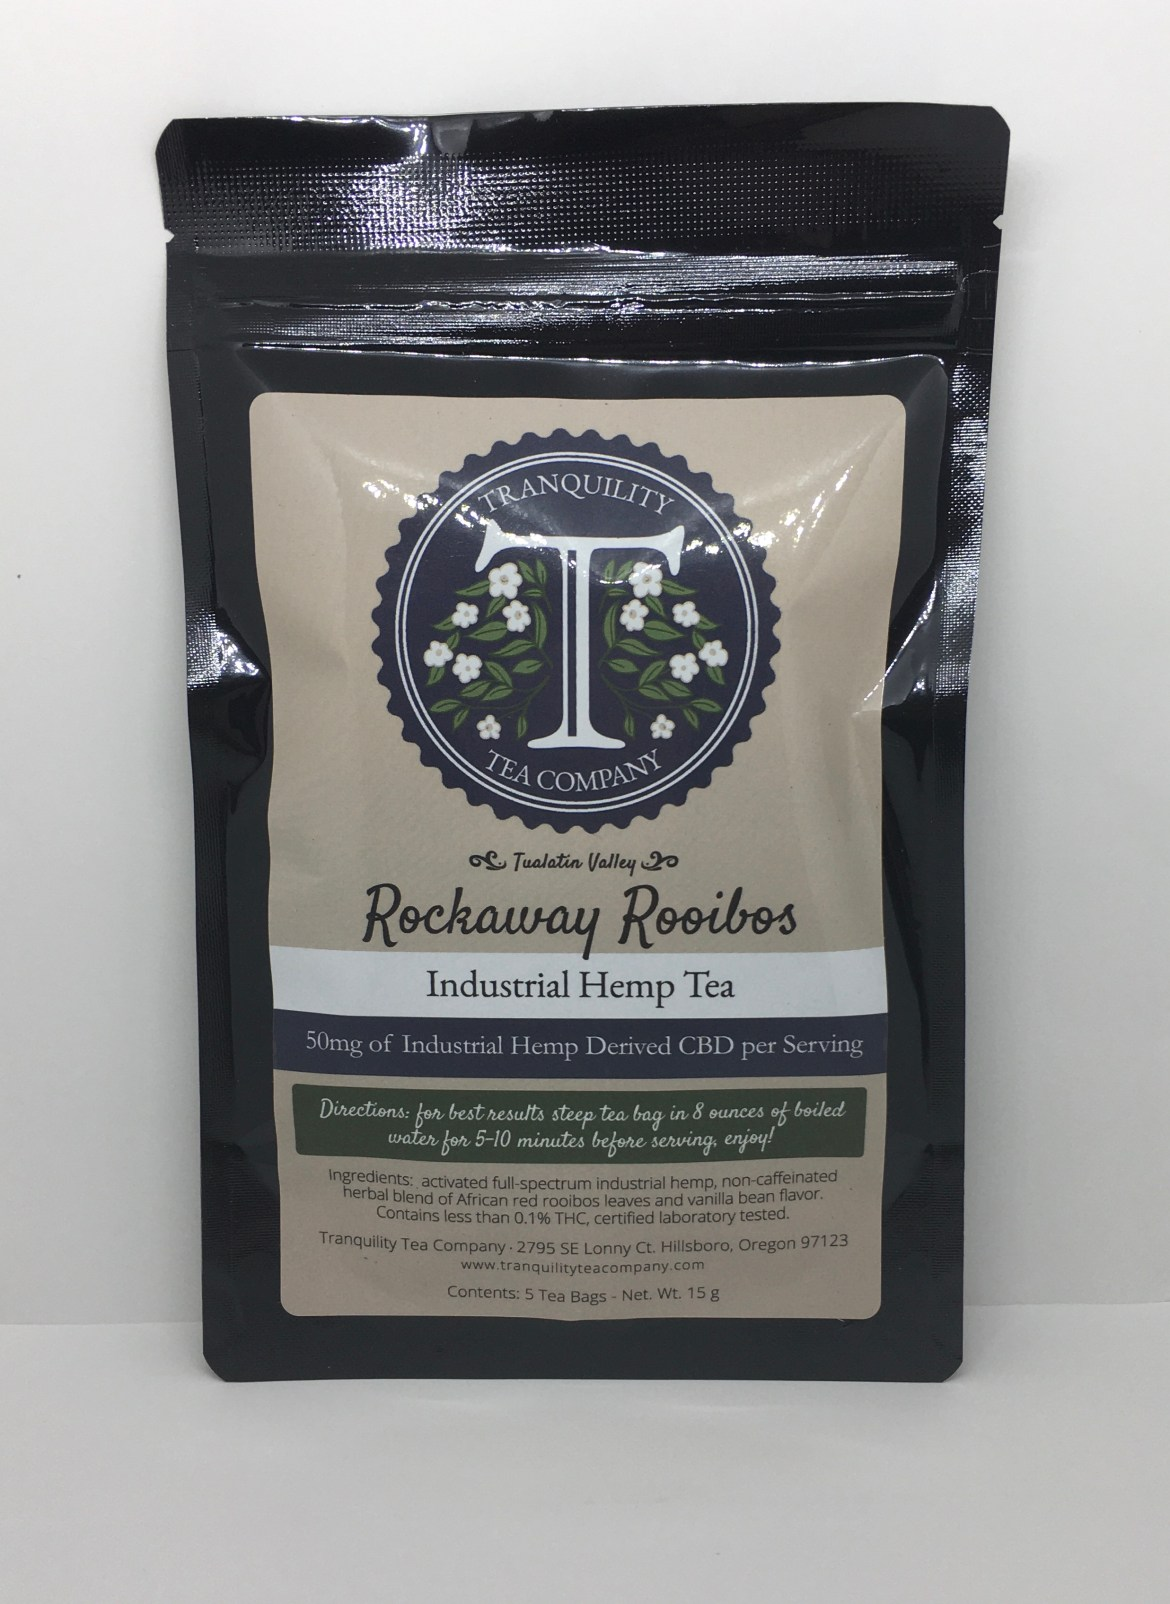 Tranquility Tea Rockaway Rooibos Tea